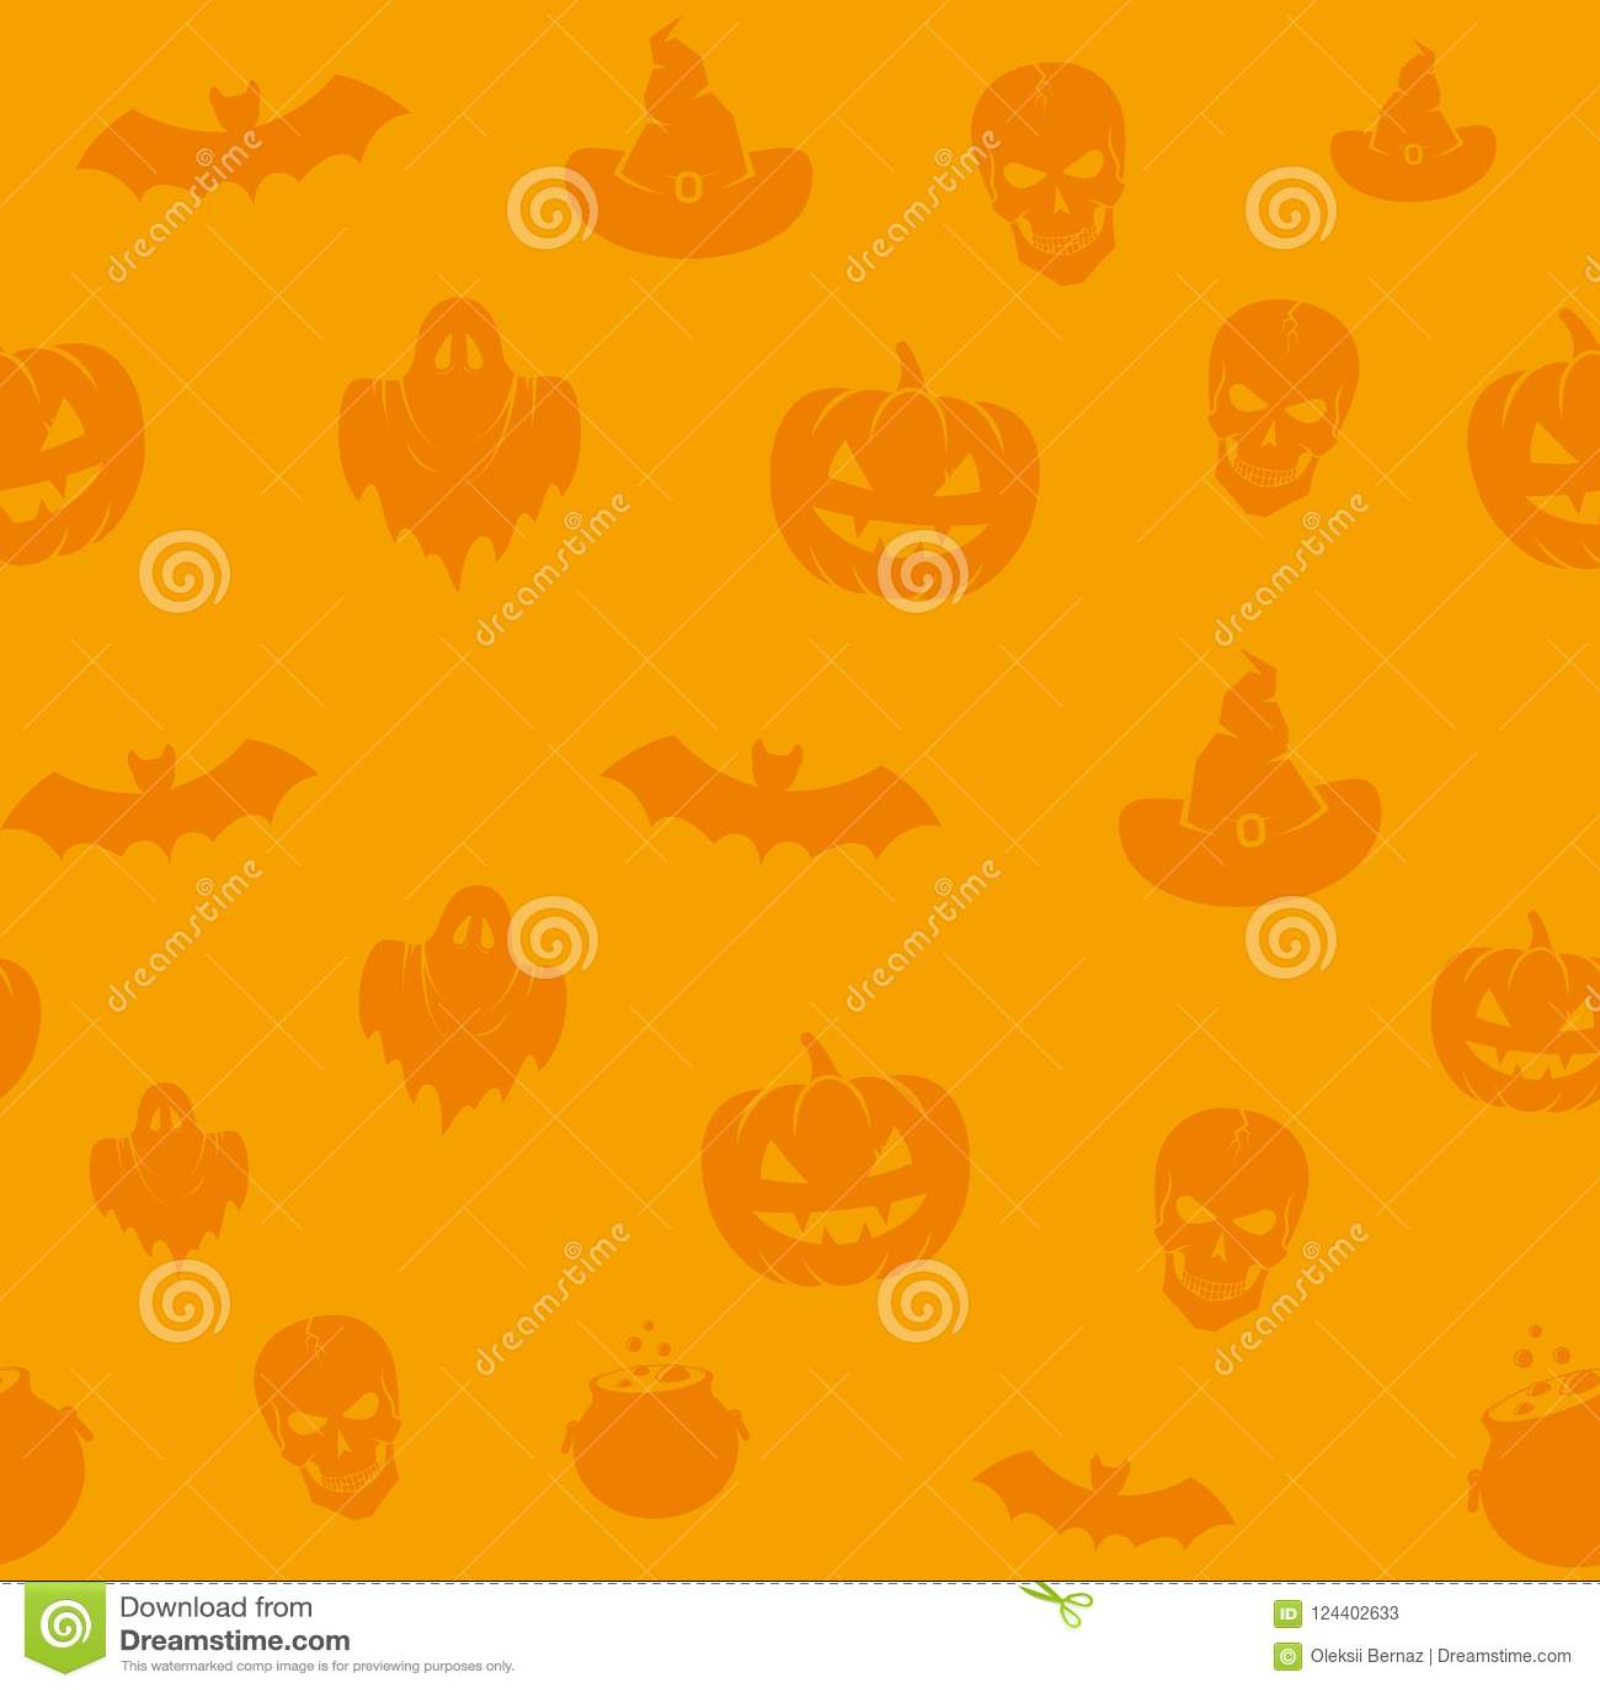 fun halloween icons vector seamless background pattern skulls